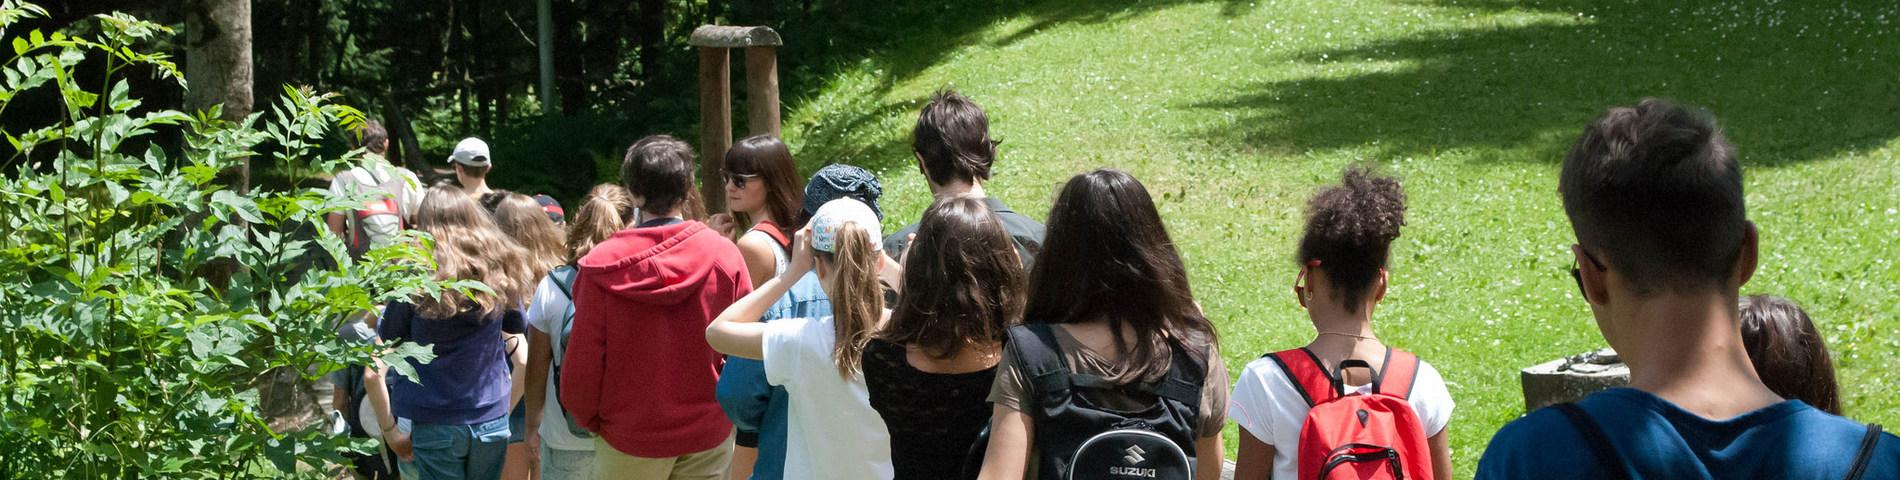 friLingue Language Camps图片1